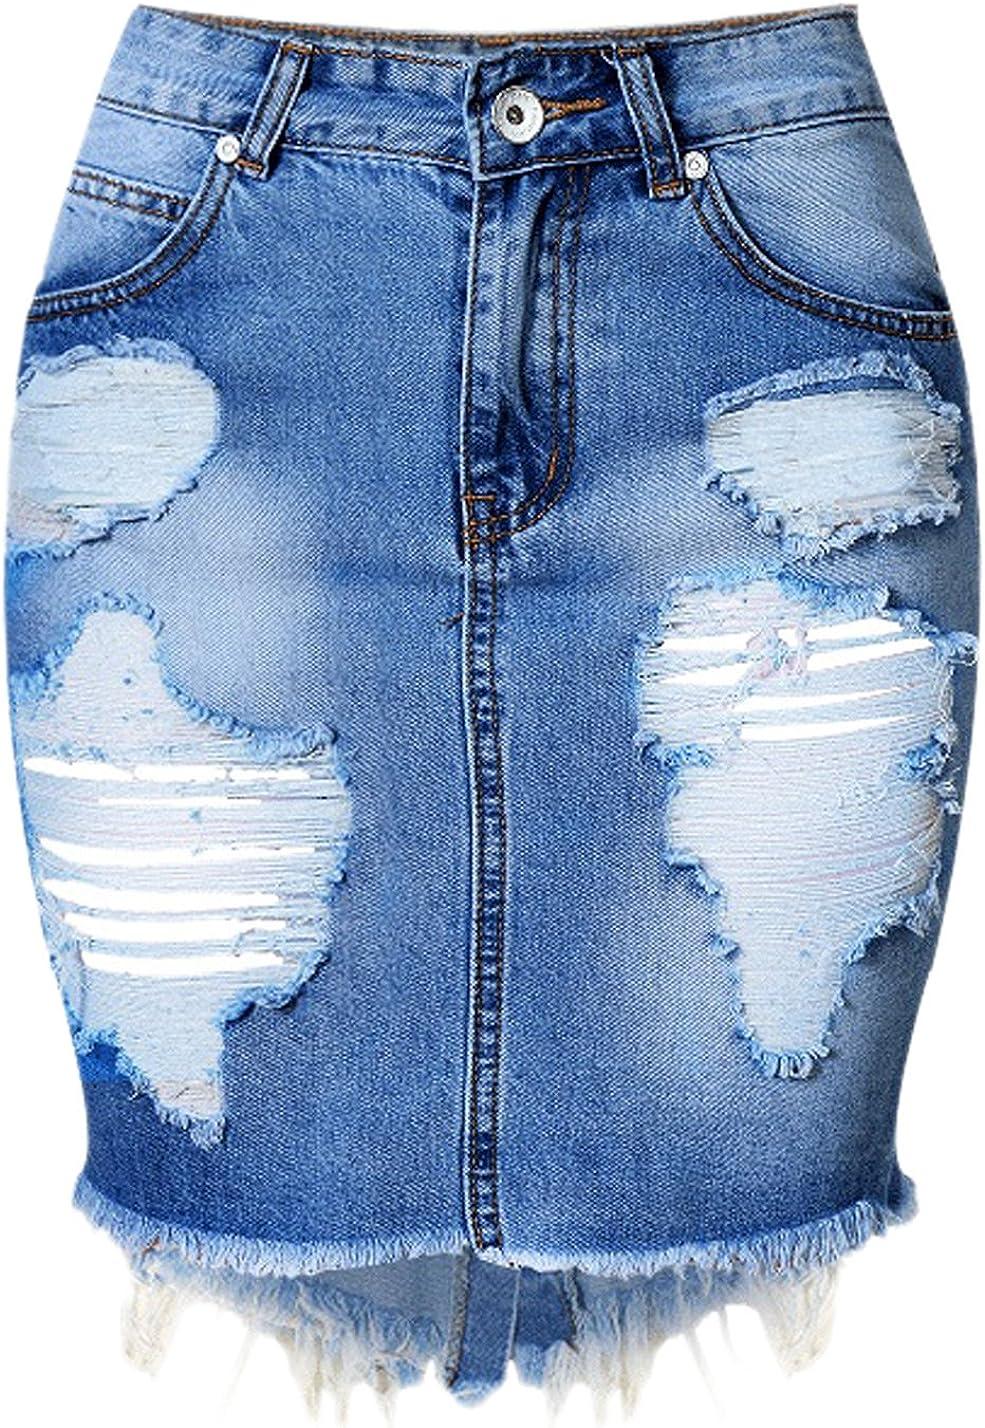 chouyatou Women's Retro High-Waist Boyfriend Ripped Holes Denim Skirt